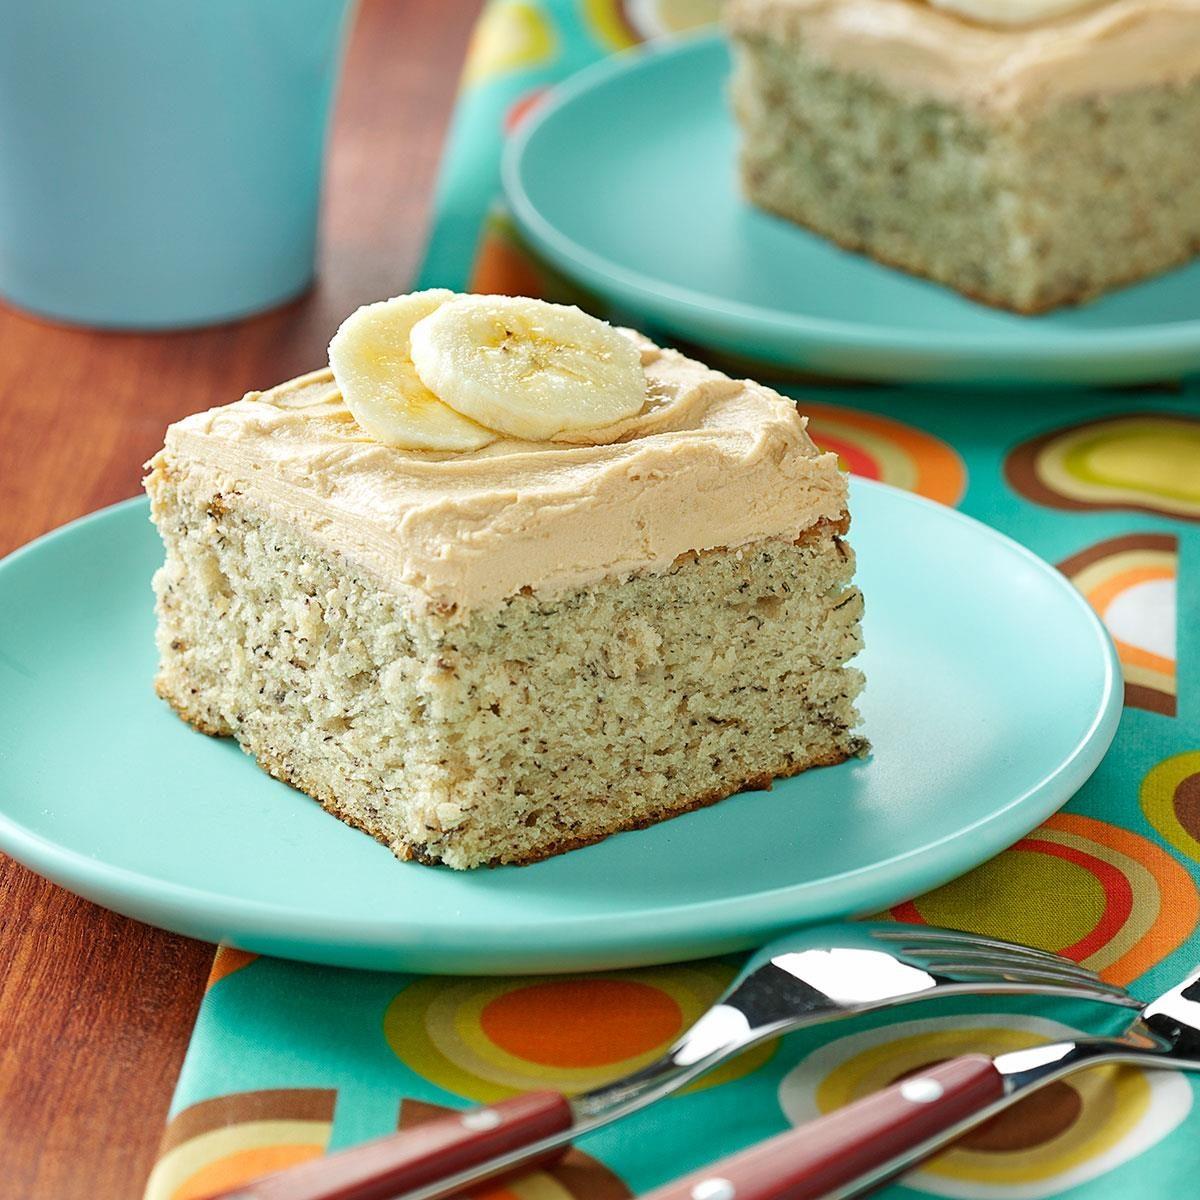 Easy desserts recipes for potluck